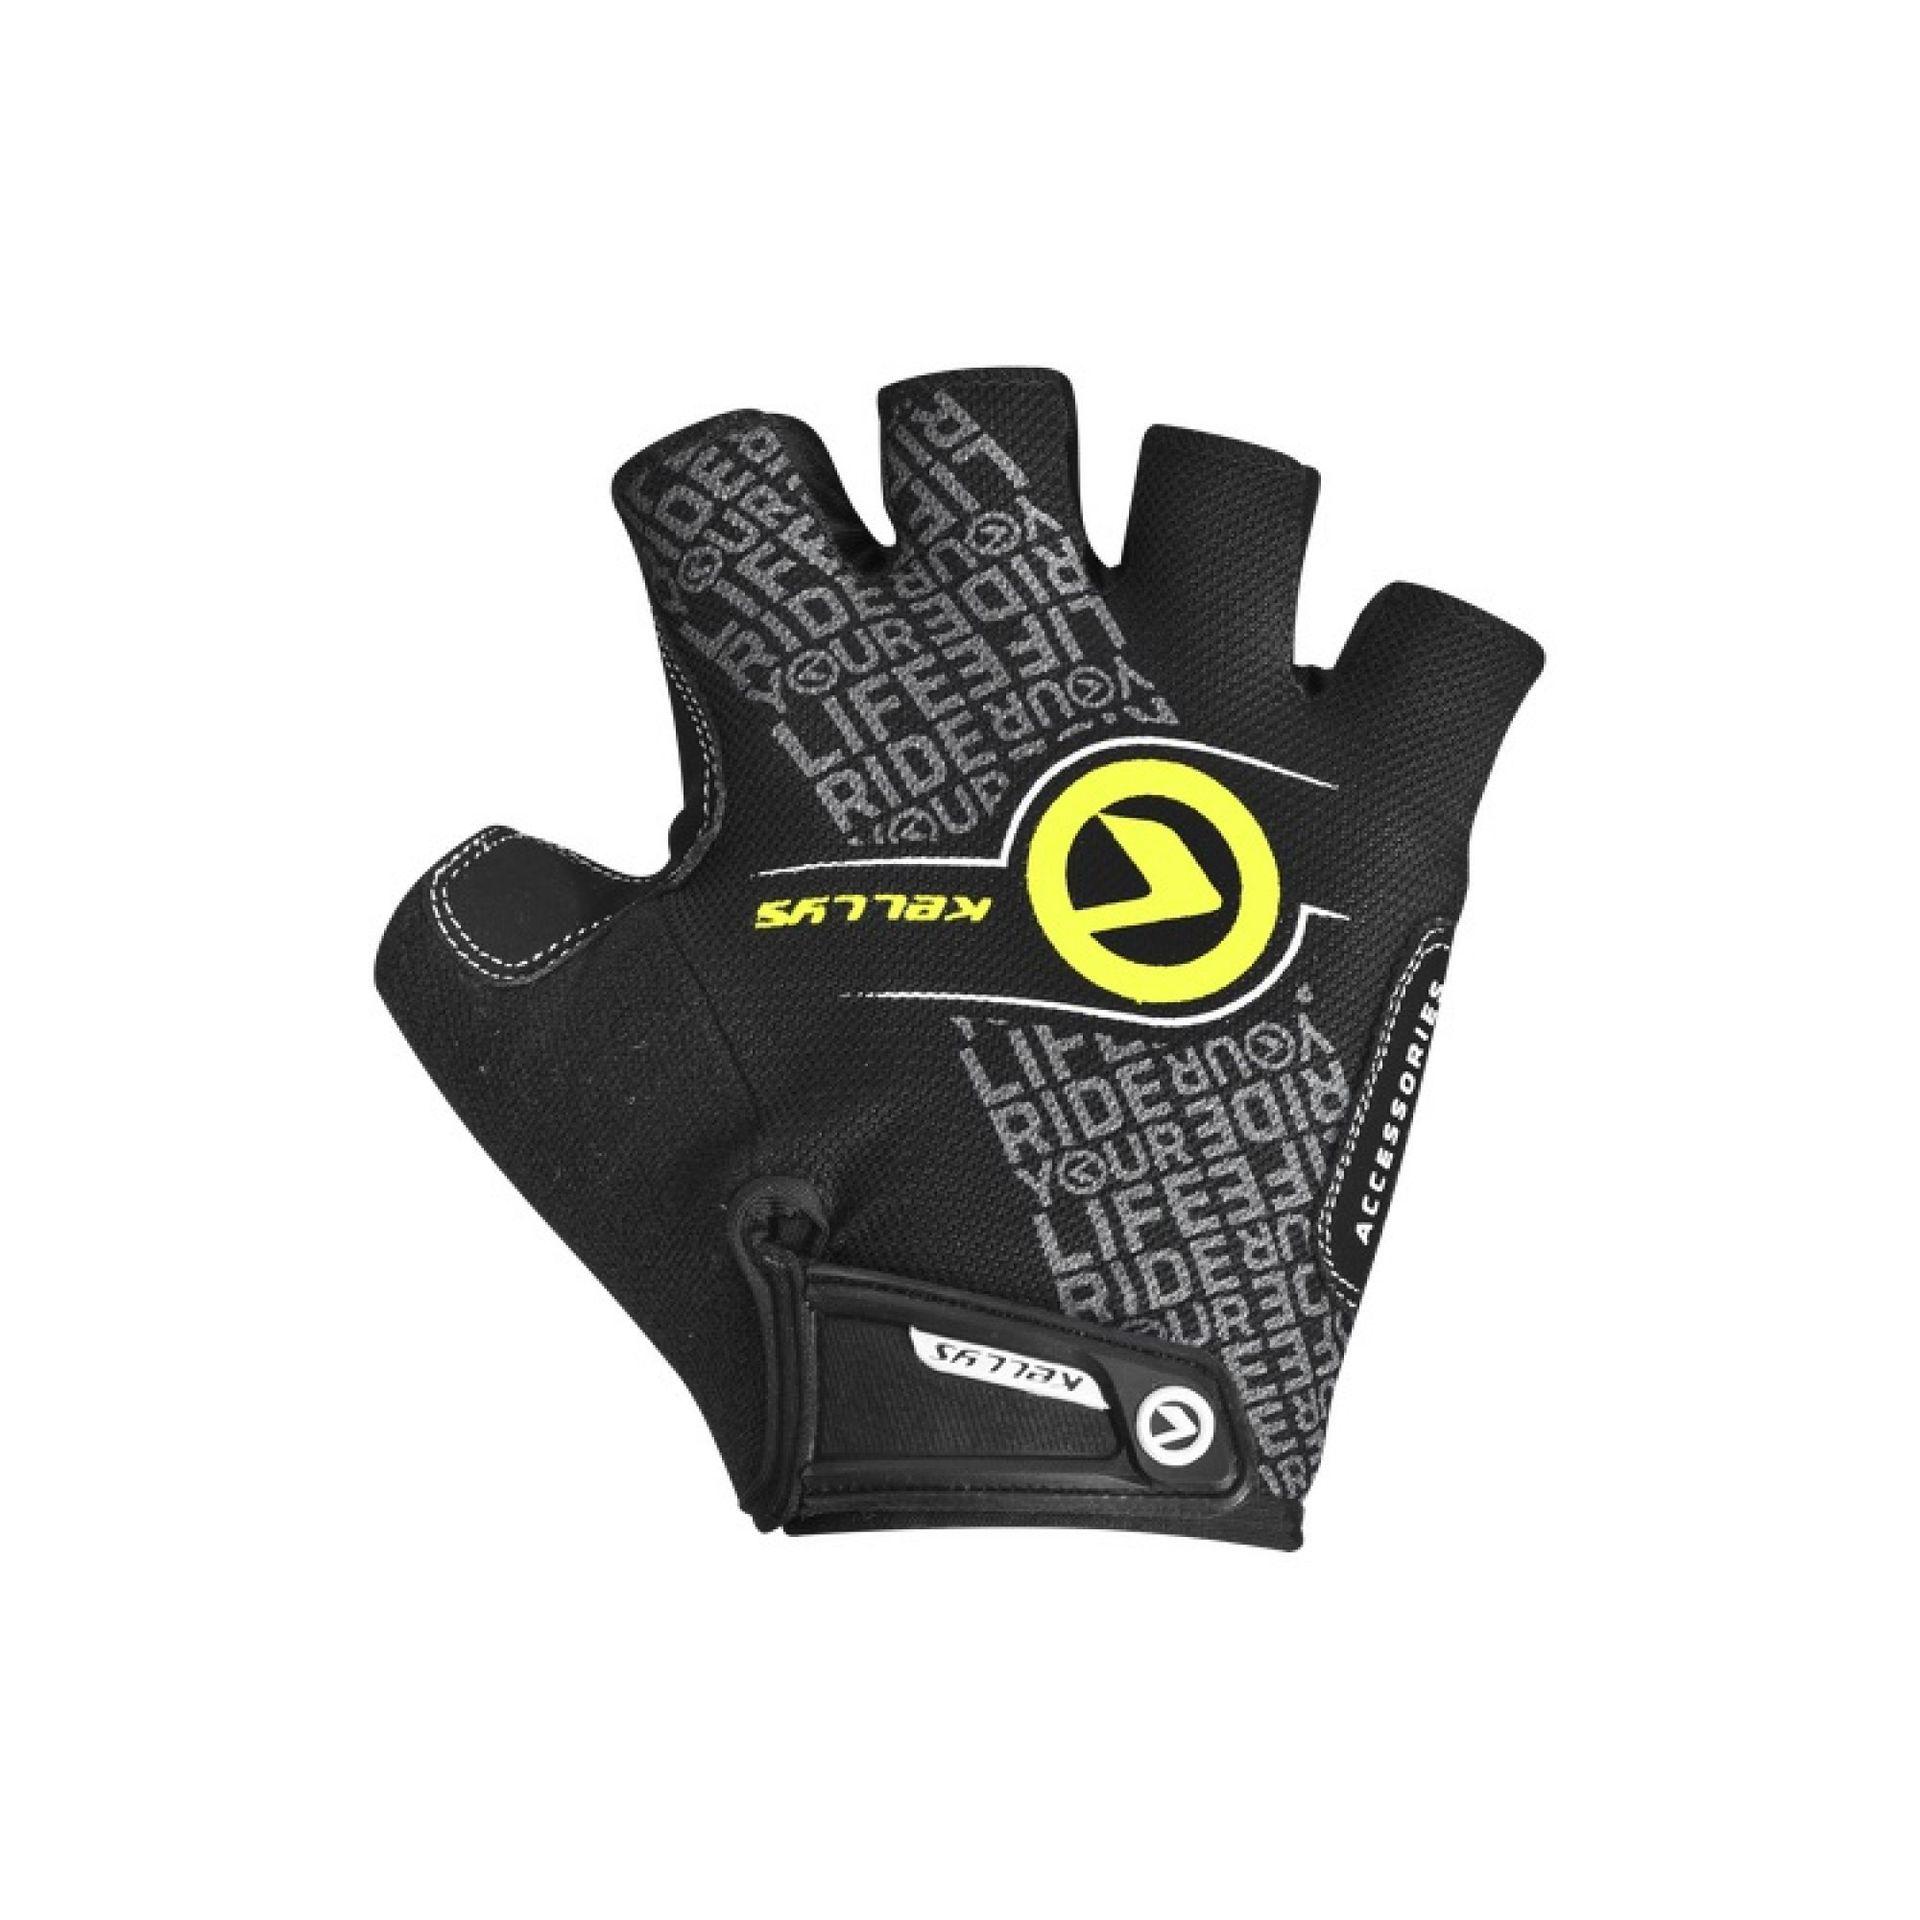 Rękawiczki rowerowe Kellys Comfort New czarne|limonkowe